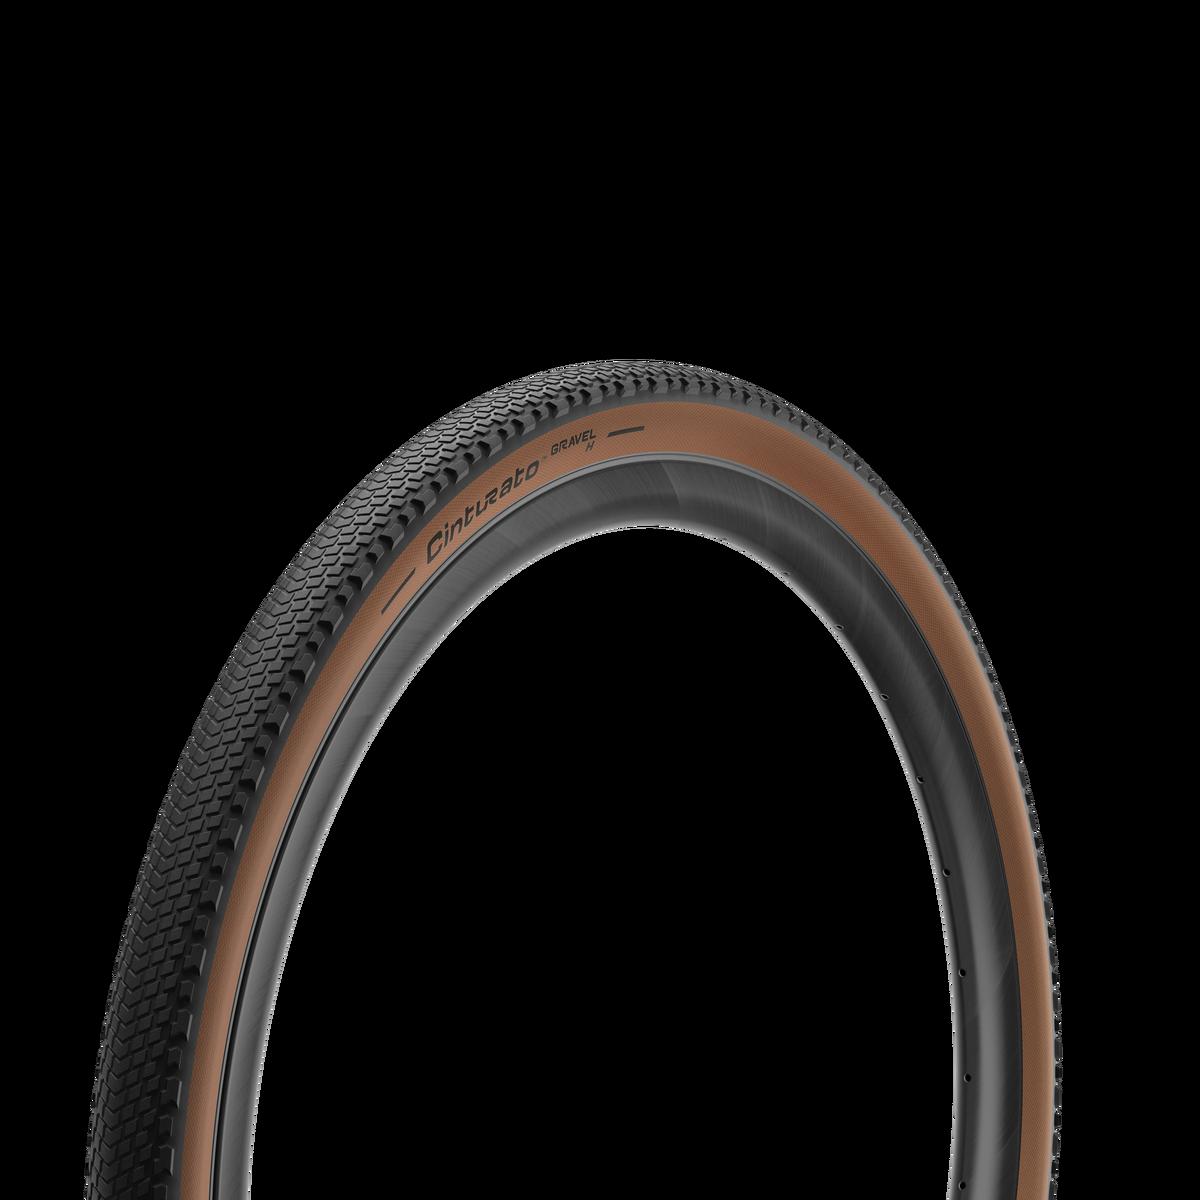 Plášť Pirelli Cinturato™ GRAVEL H 45-622 Classic od ninex.cz